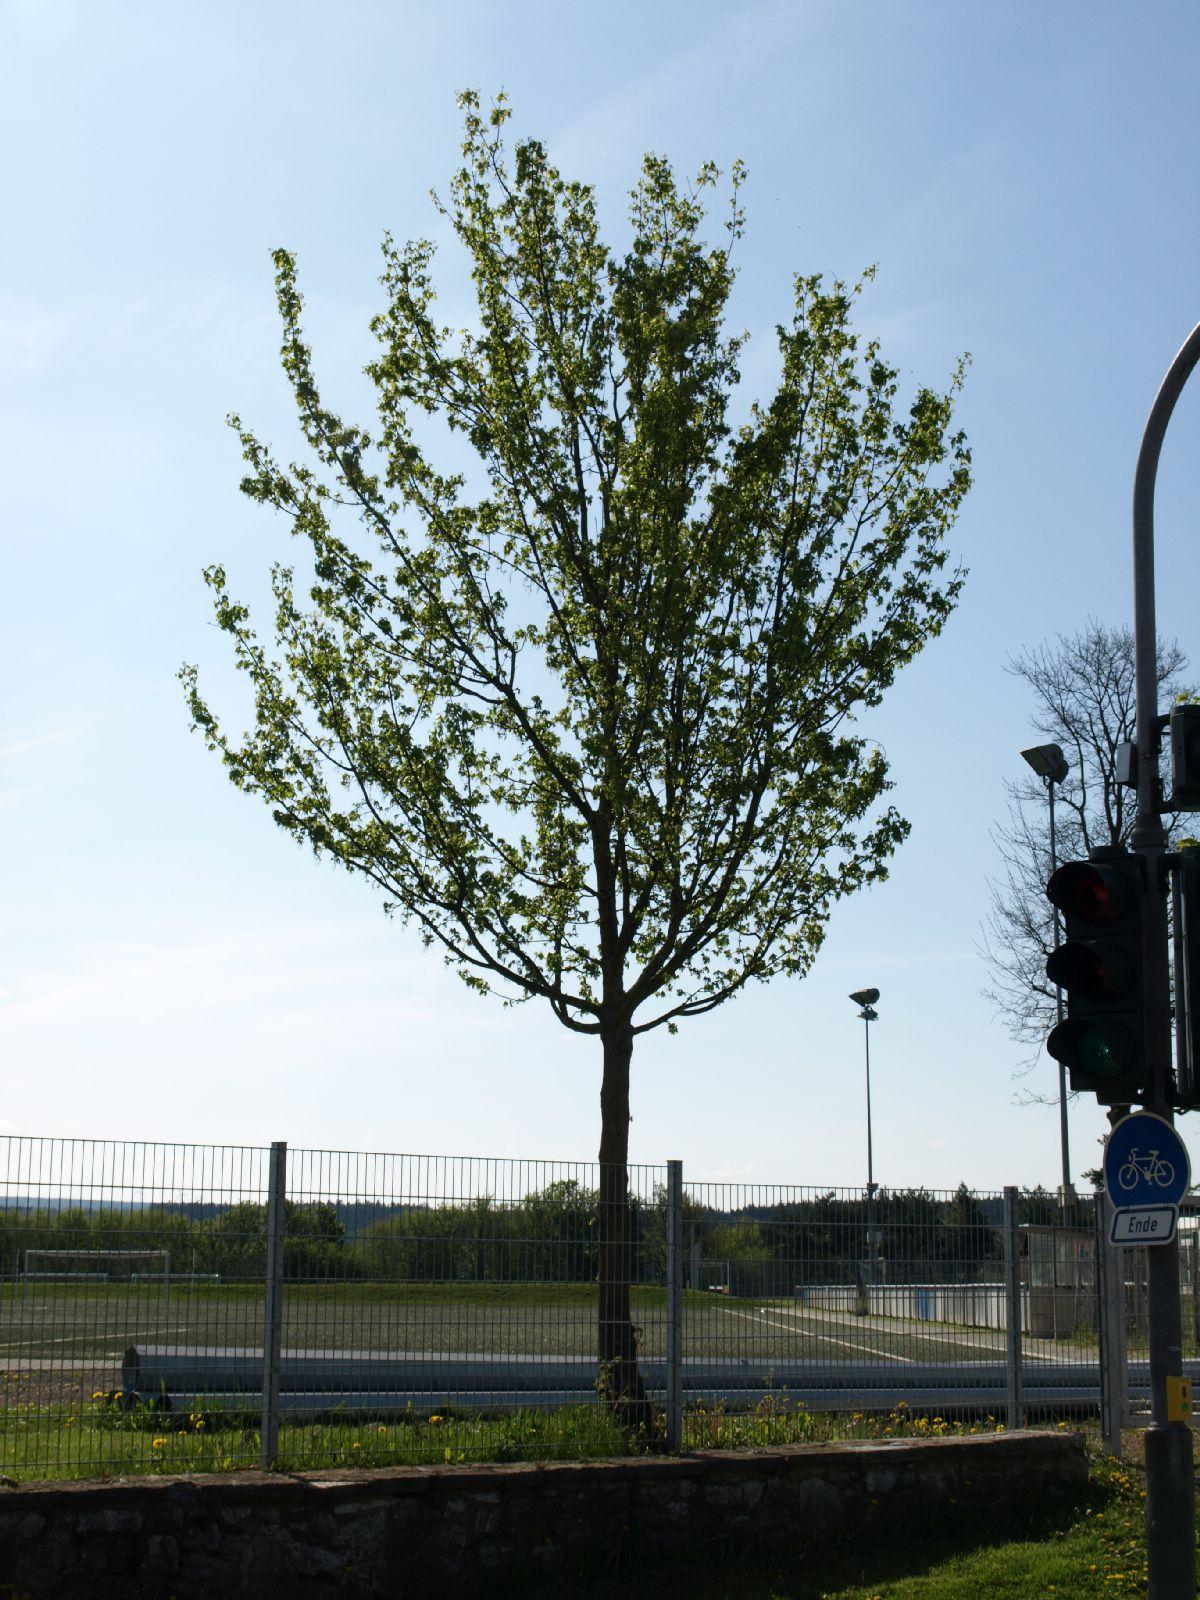 Pflanzen-Baum-Foto_Textur_B_P5032298